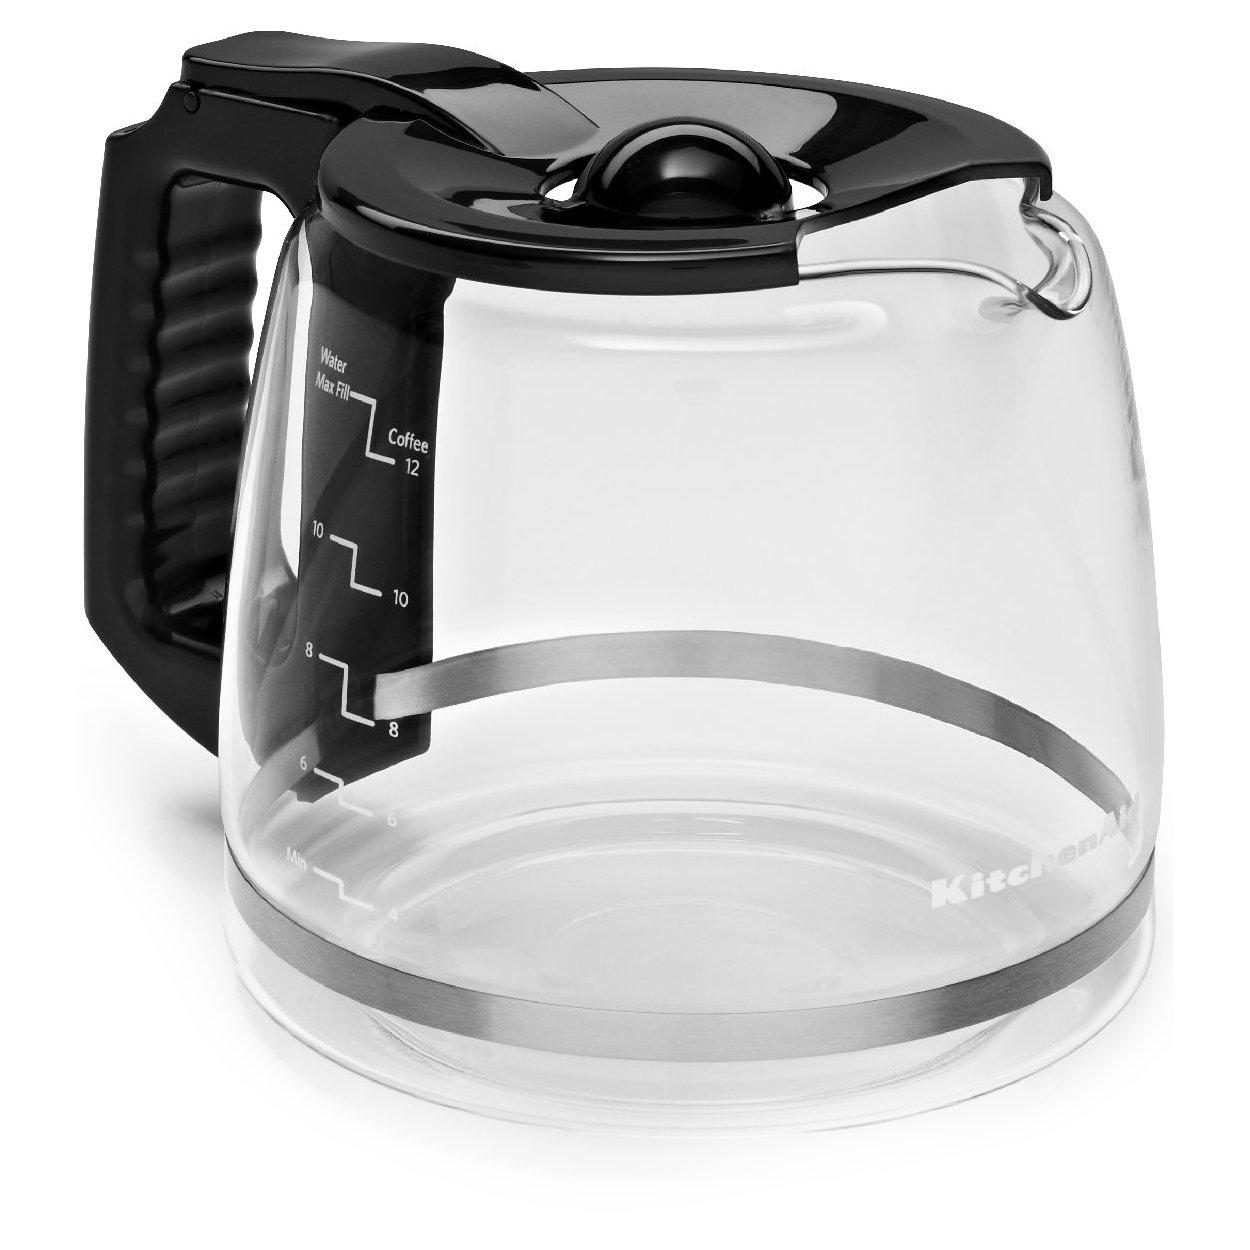 KitchenAid KCM11GC 12 Cup Glass Carafe